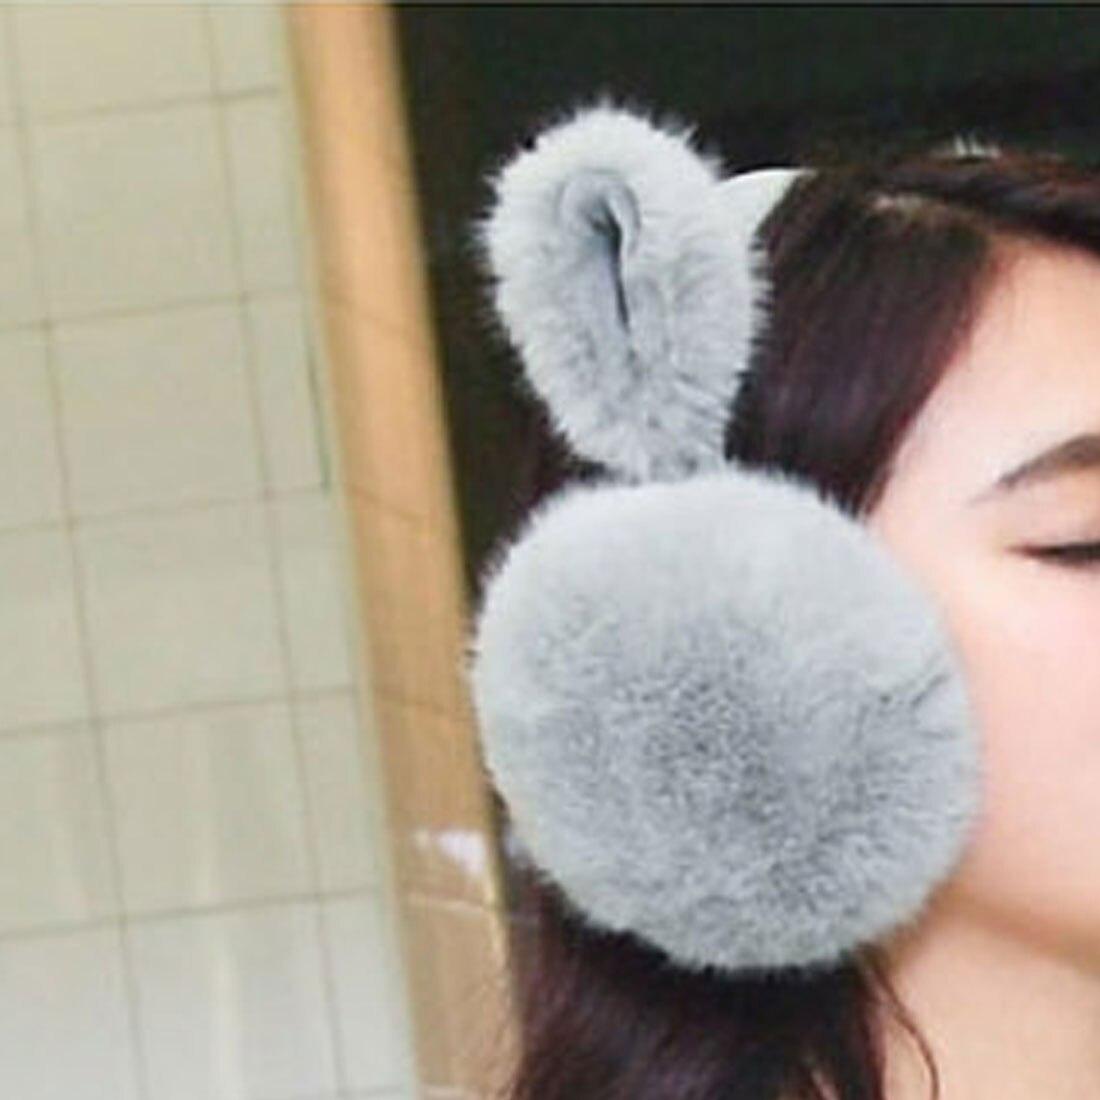 2017 Hot Winter Soft Rabbit Earmuffs For Women Warm Fur Ear Cover Winter Warm Ear Warmers Gifts For Girls Female